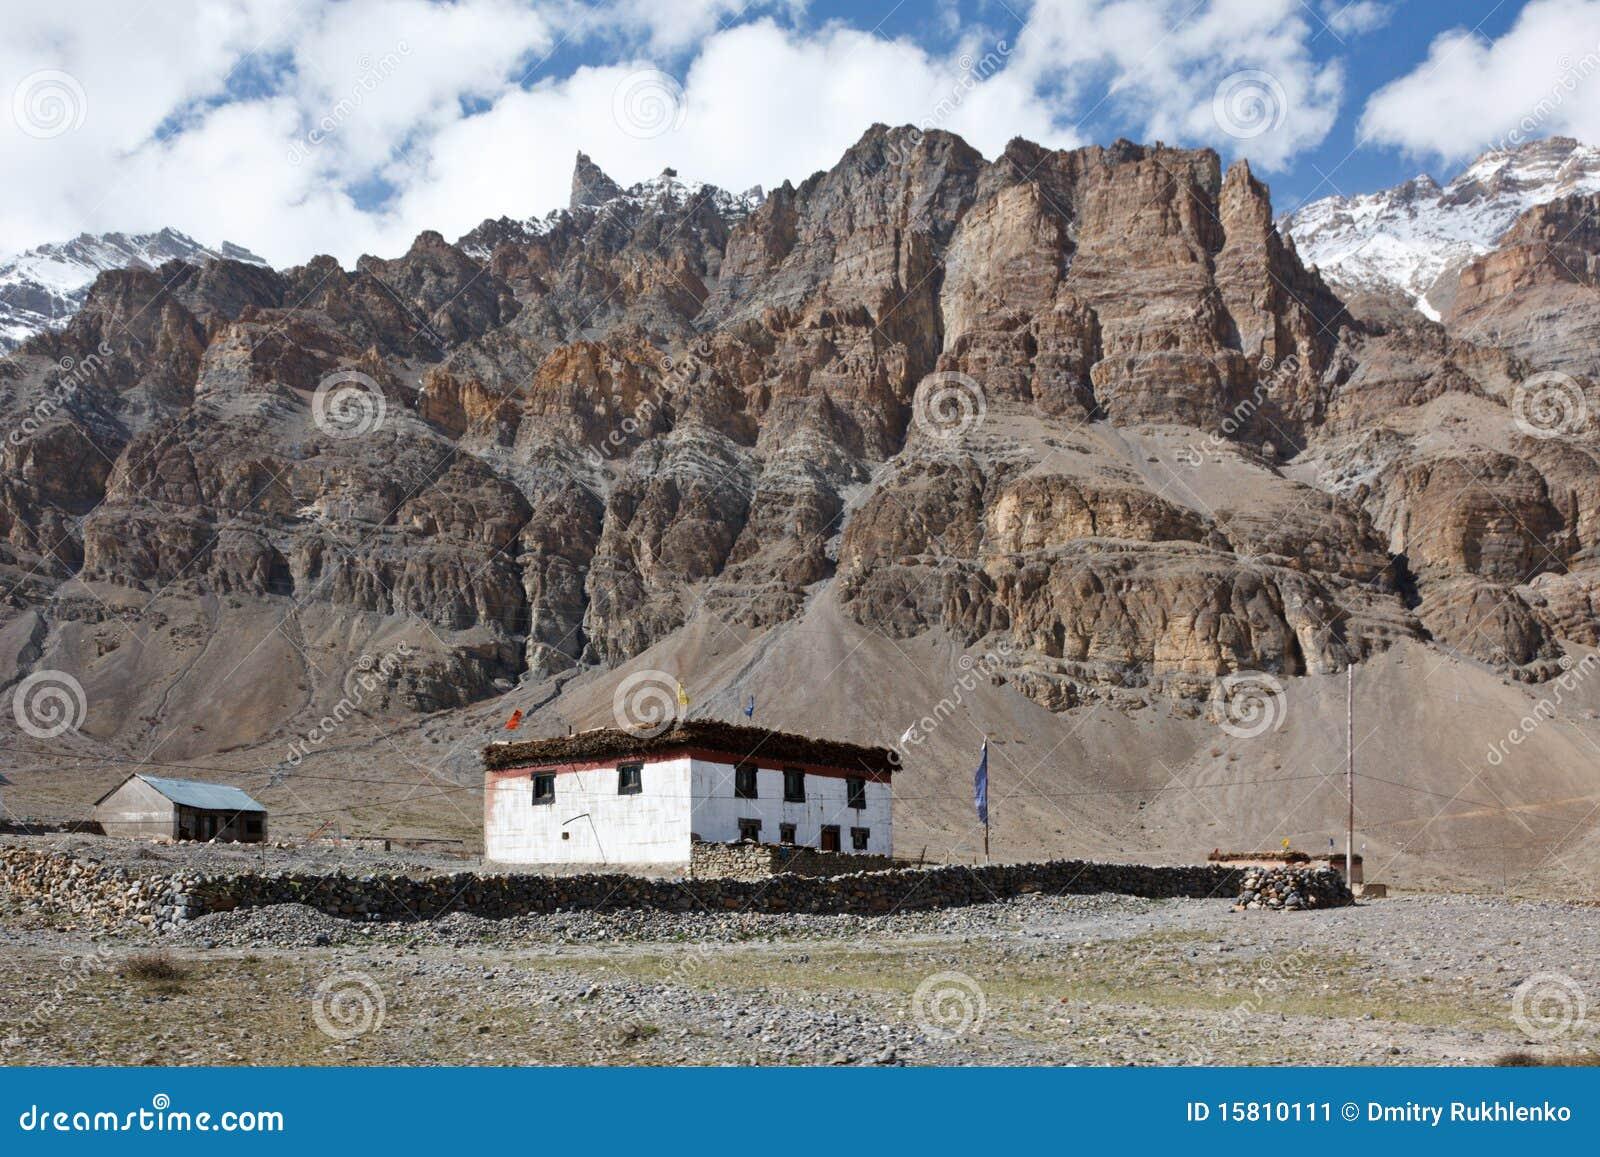 House In Himalaya Mountains Stock Image Image 15810111